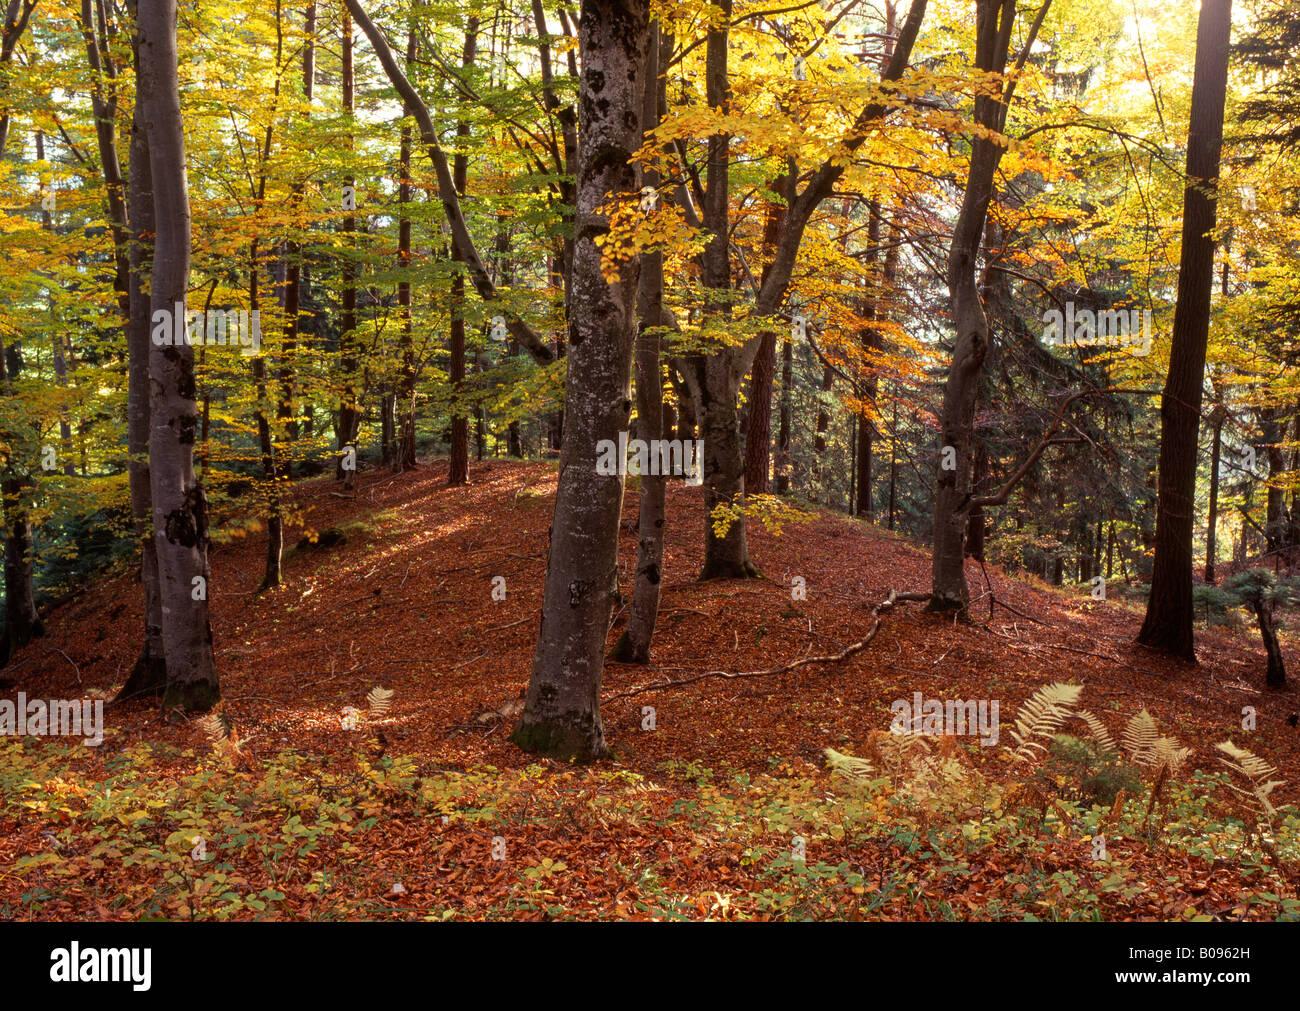 Beech grove (Fagus) in autumn, Bauhof, Vomp, Tyrol, Austria, Europe Stock Photo